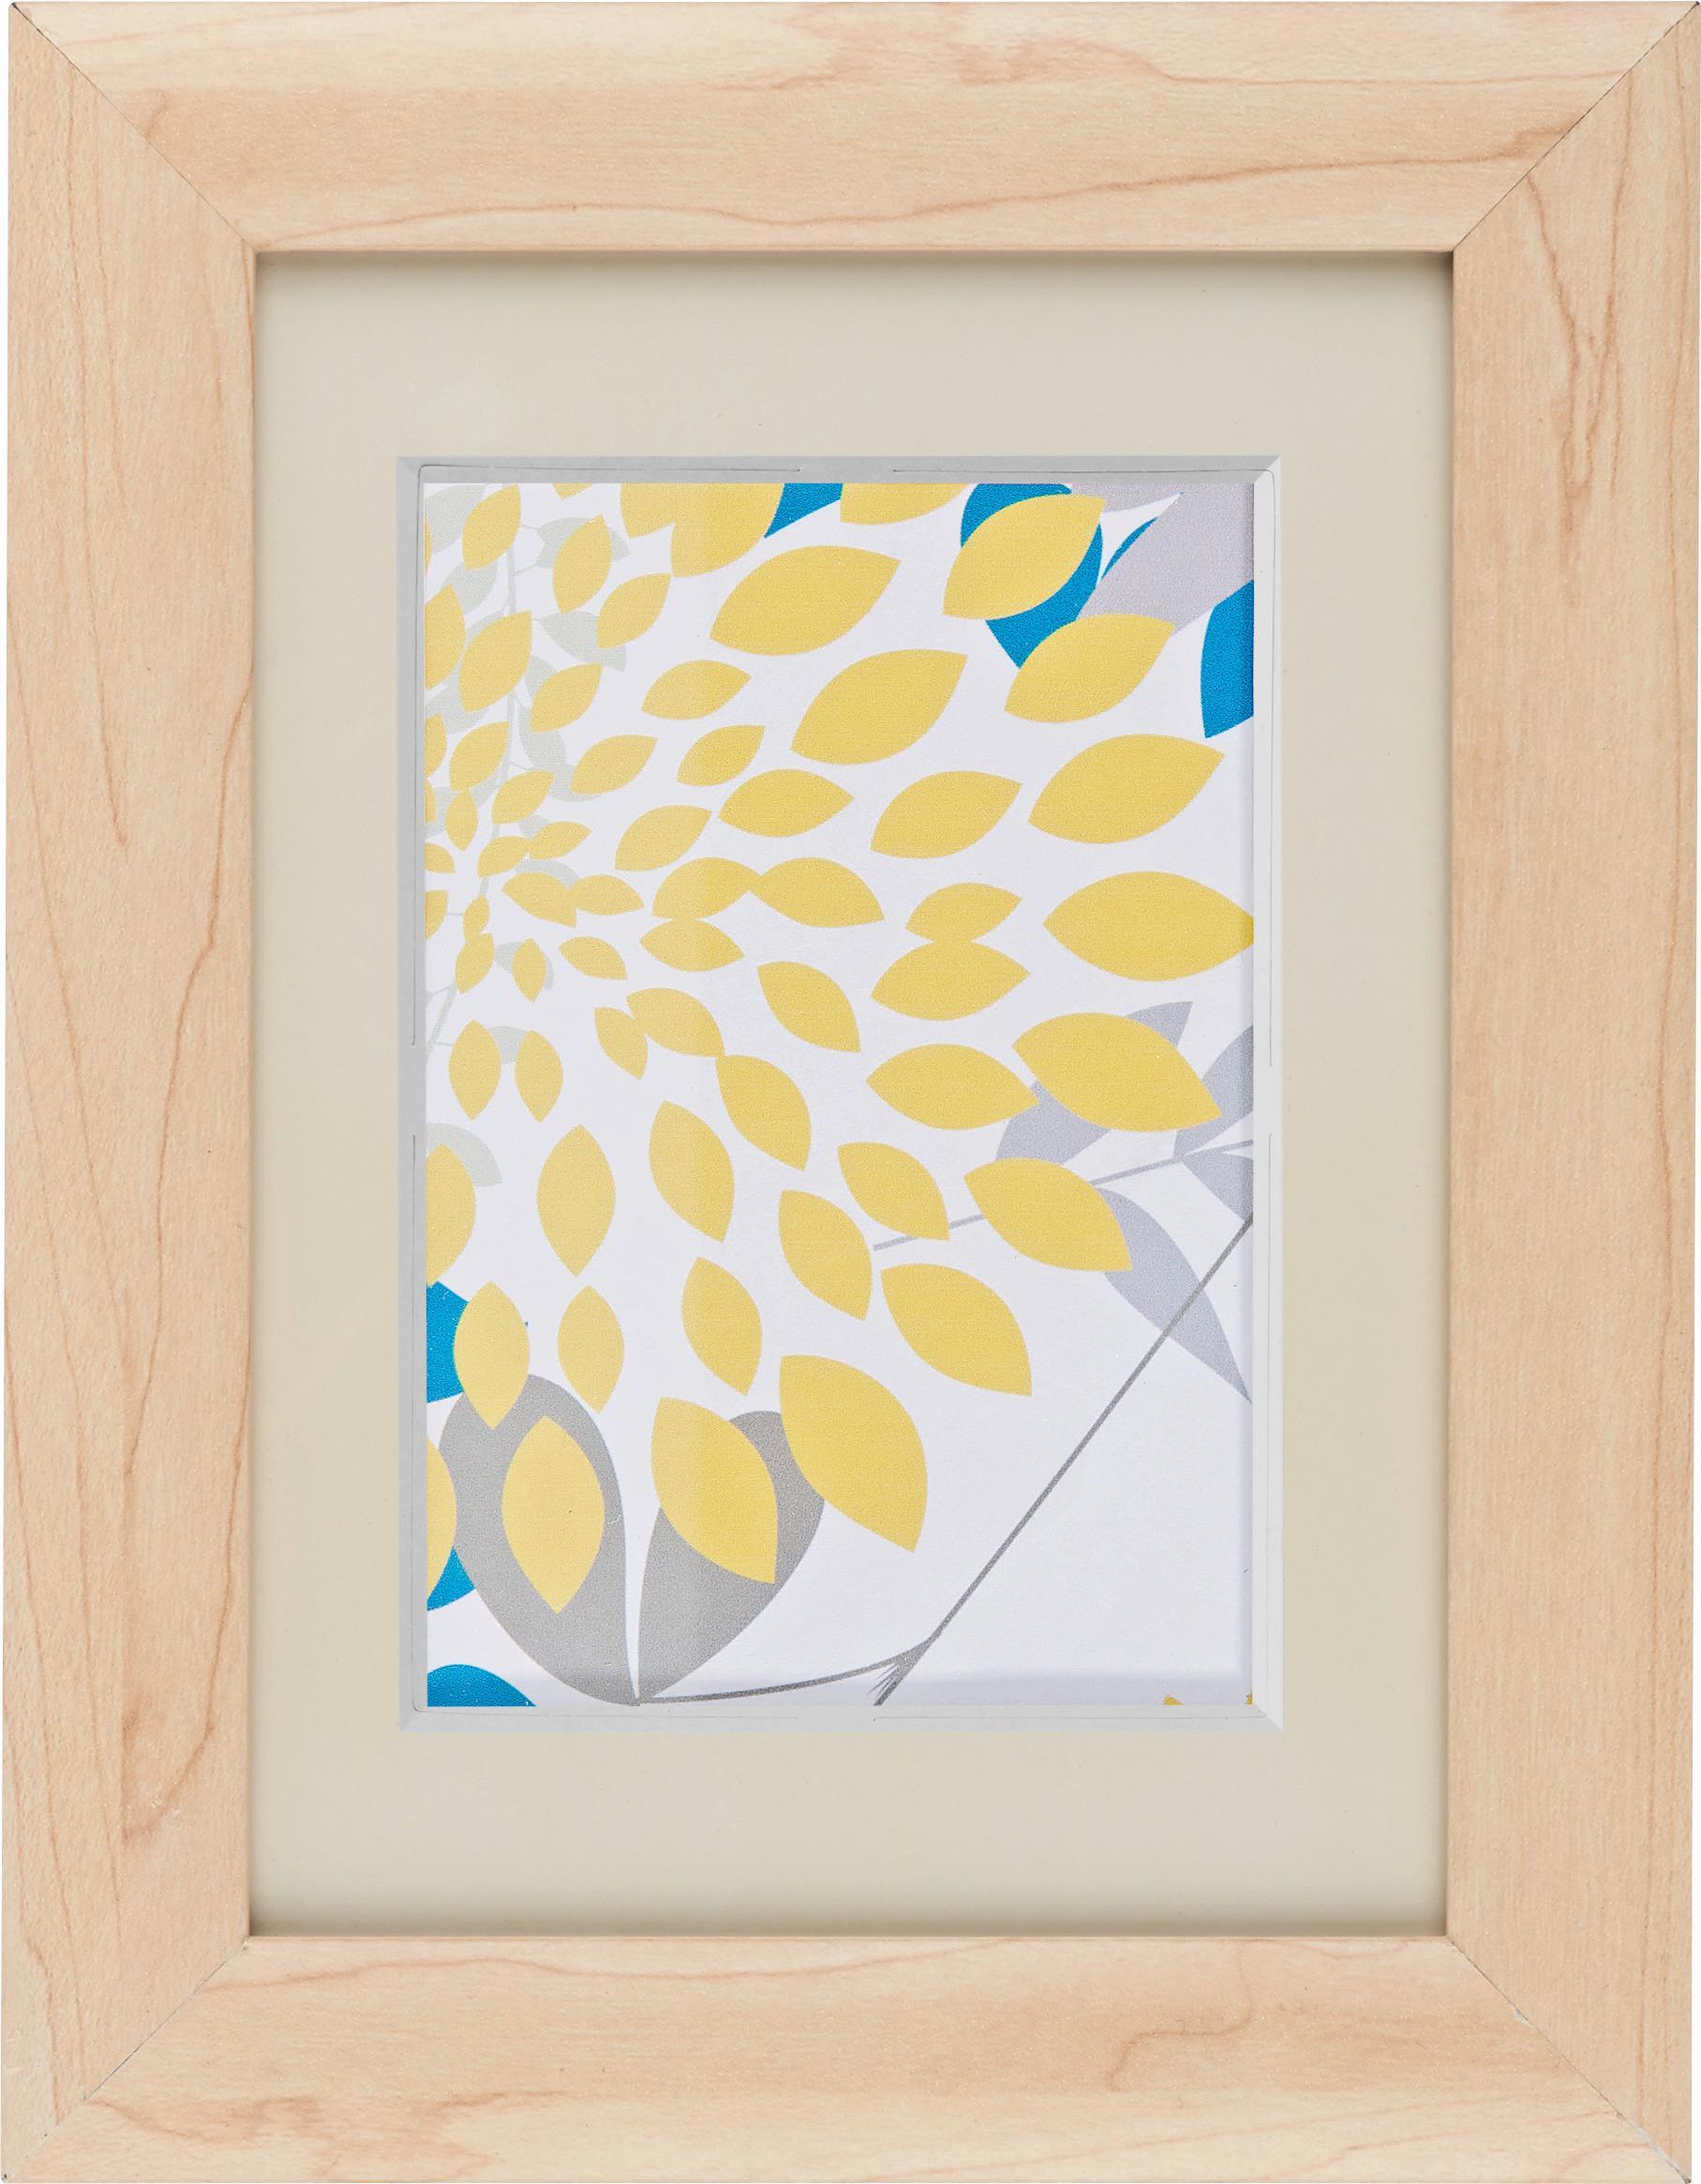 Image of Bilderrahmen Anna aus Holz ca. 13x18cm